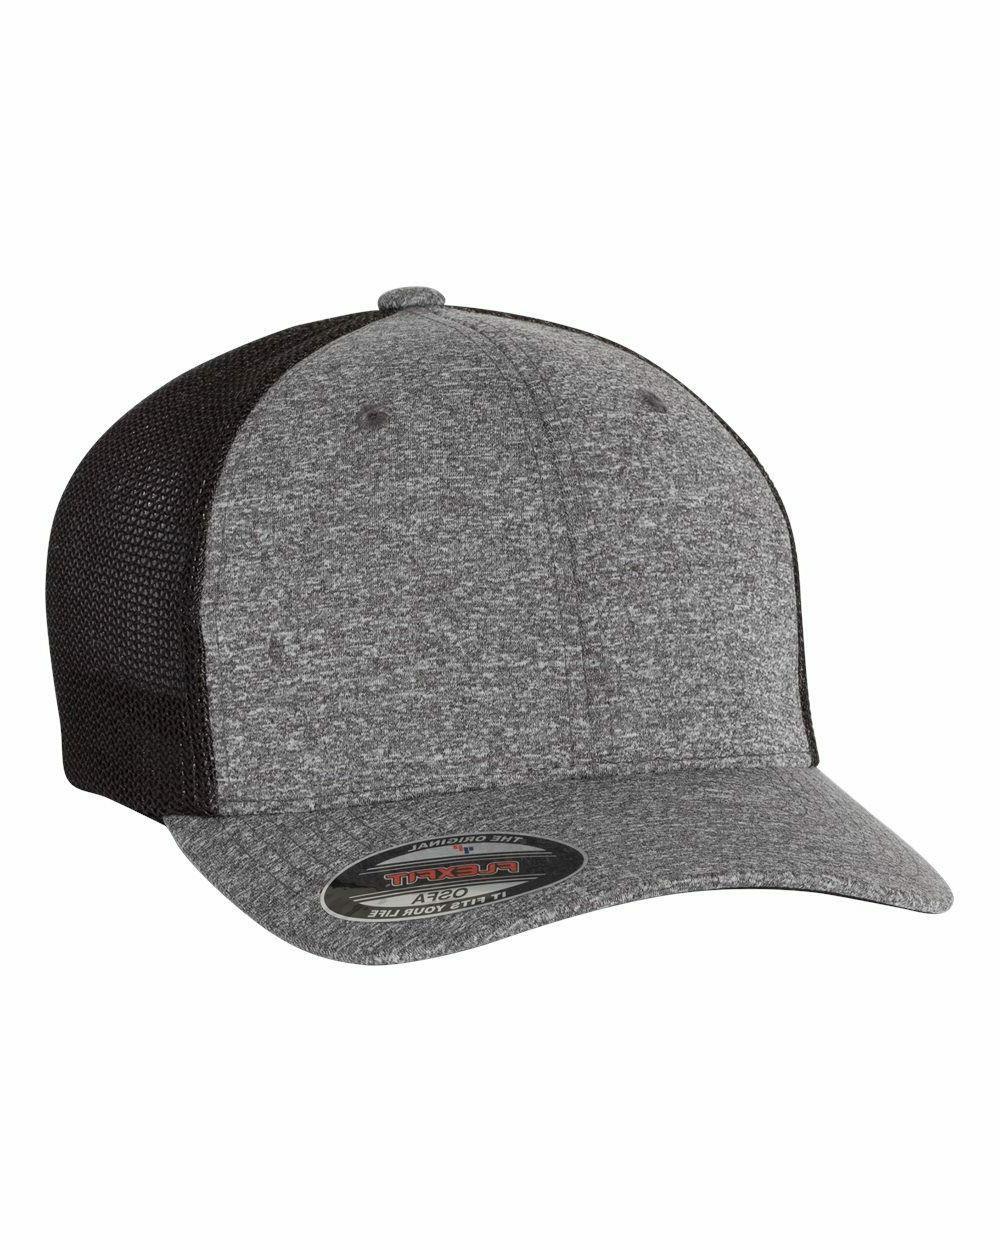 FLEXFIT POLY JERSEY STRETCH Dri-fit MESH TRUCKER CAP, 6311